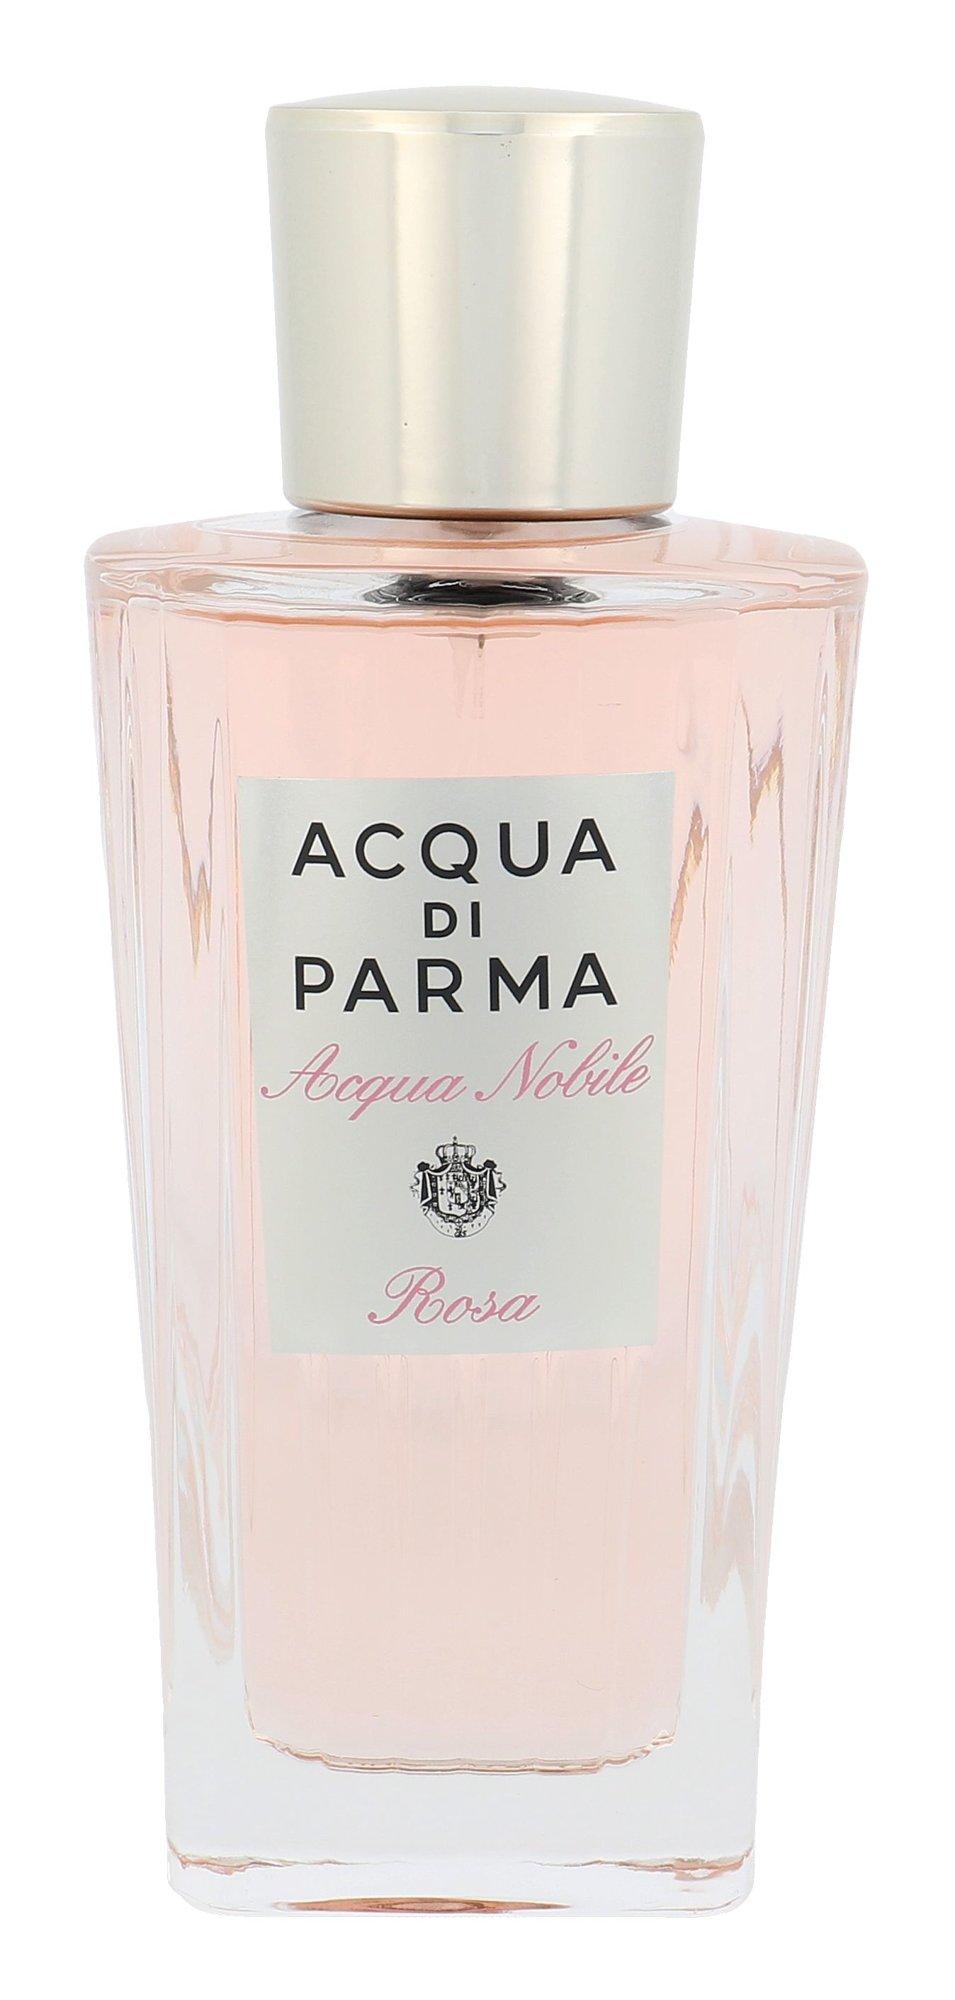 Acqua di Parma Acqua Nobile Rosa EDT 75ml